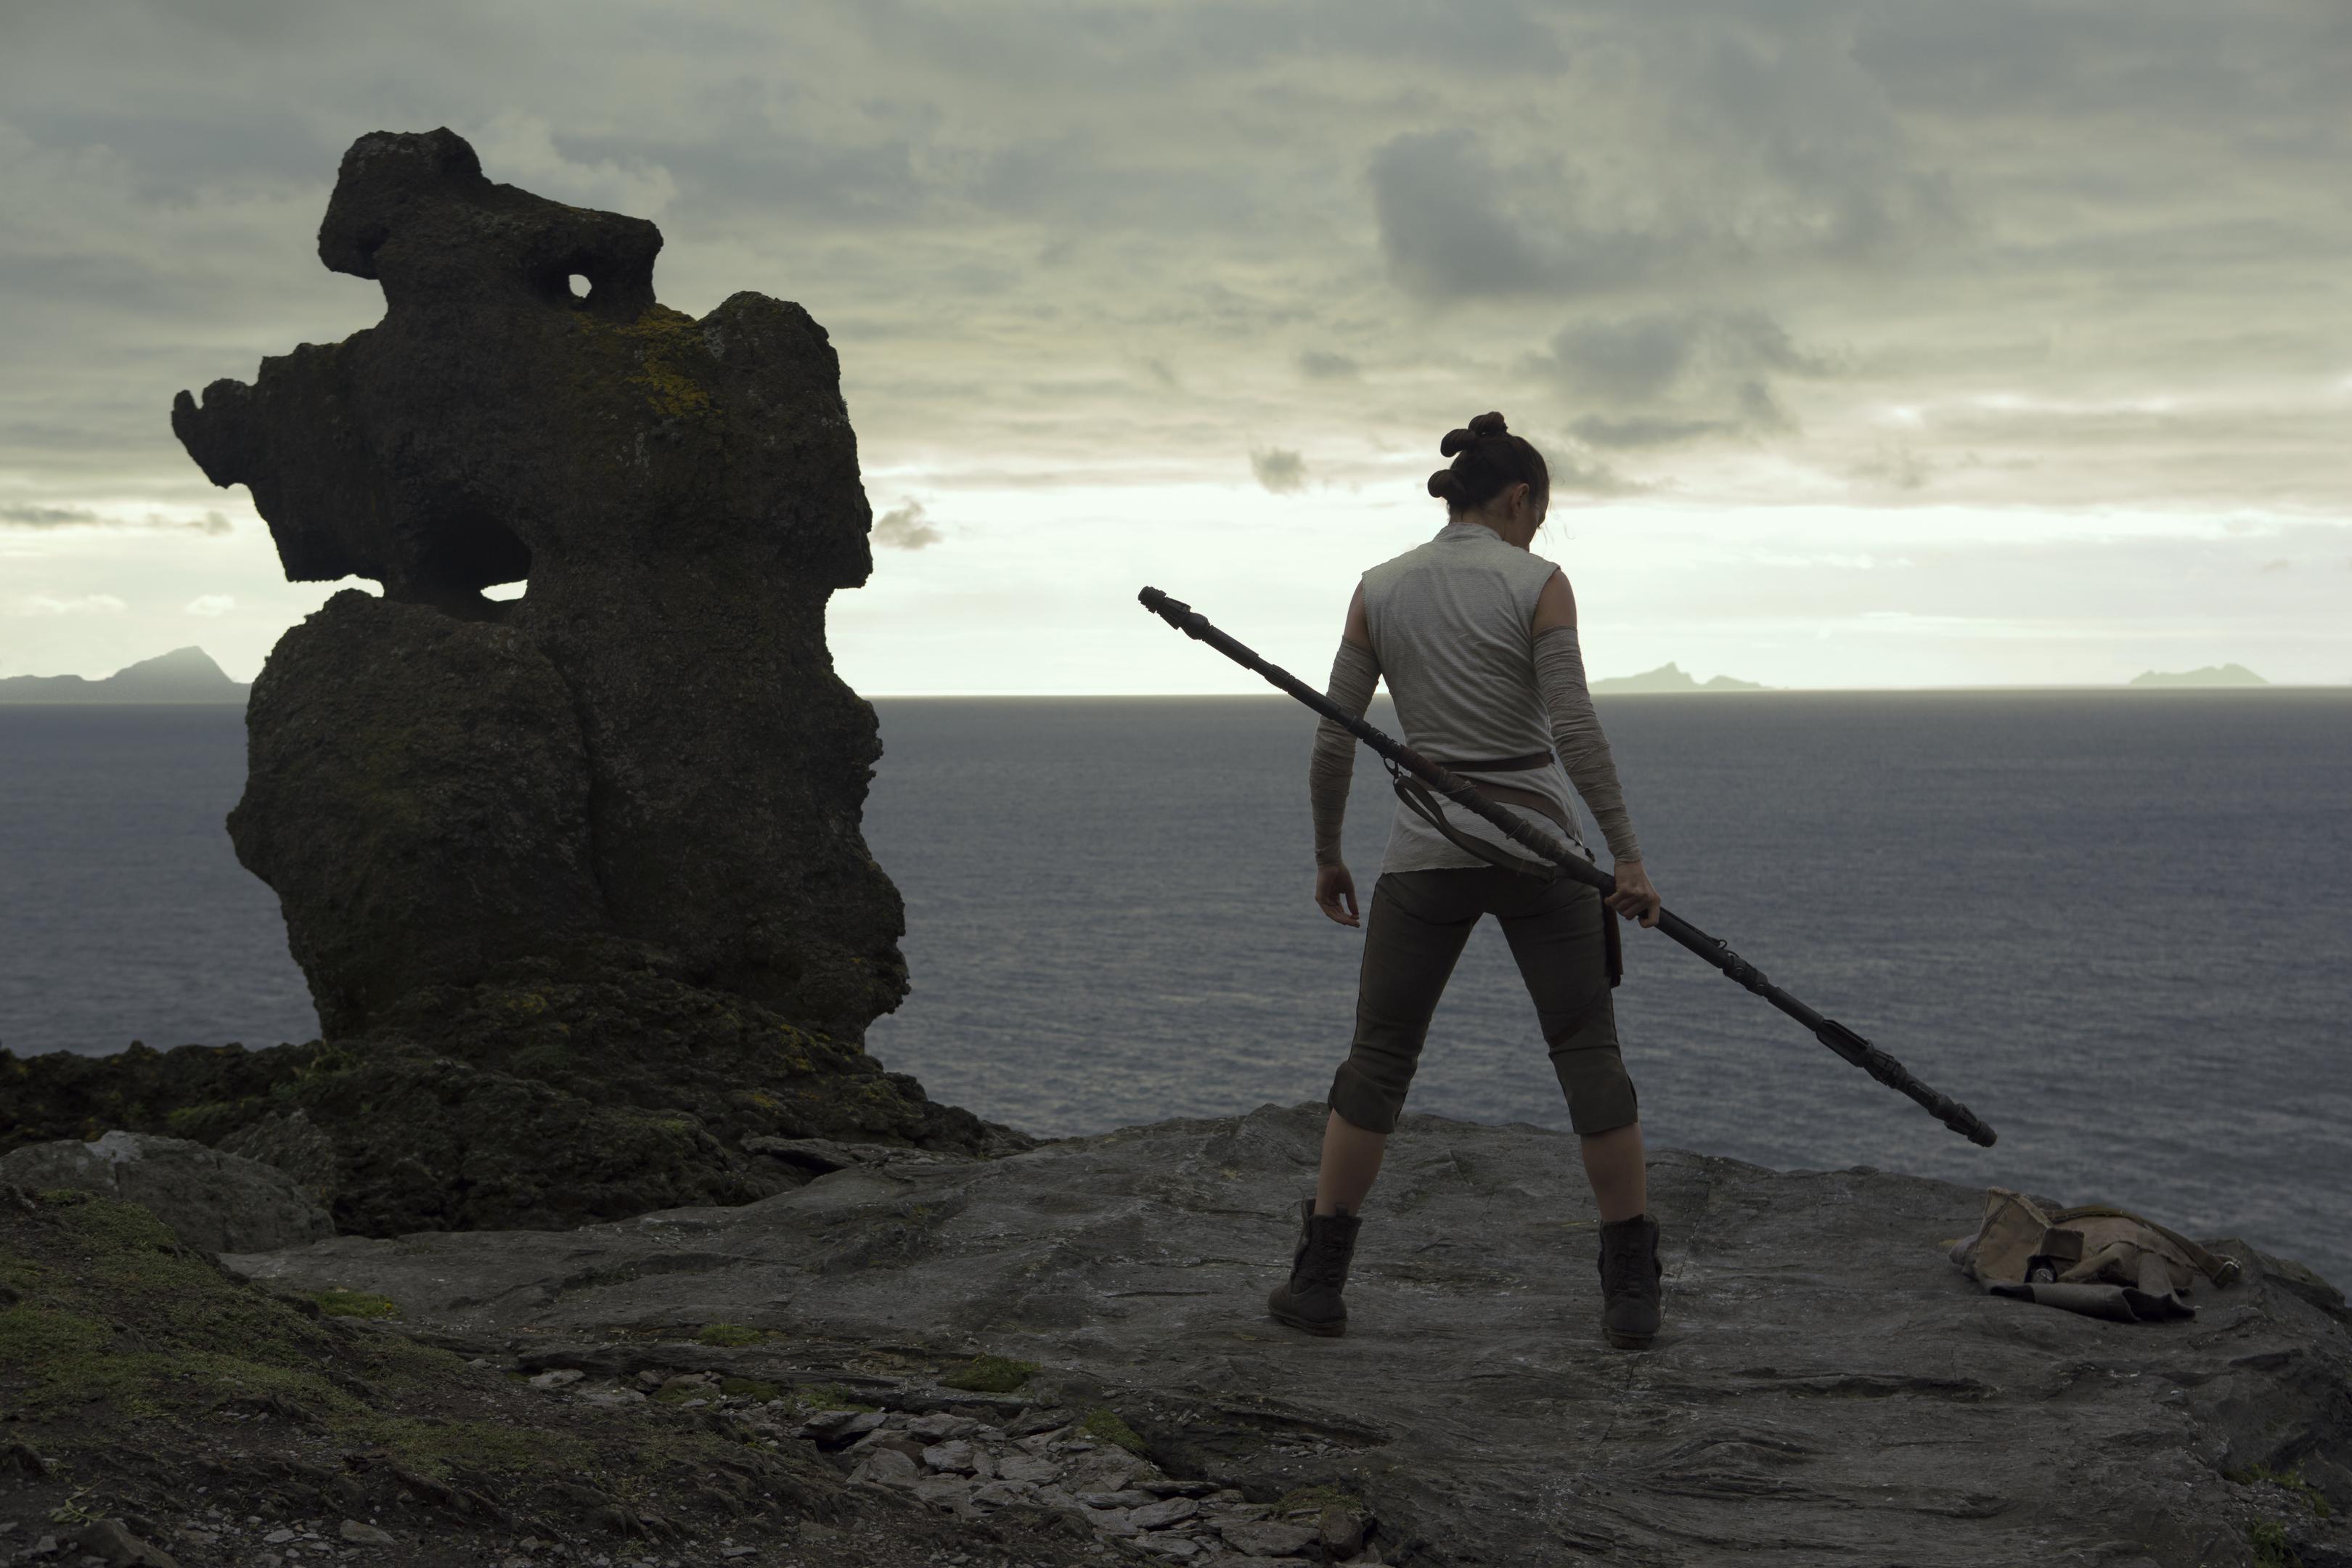 Rey in Star Wars: The Last Jedi.